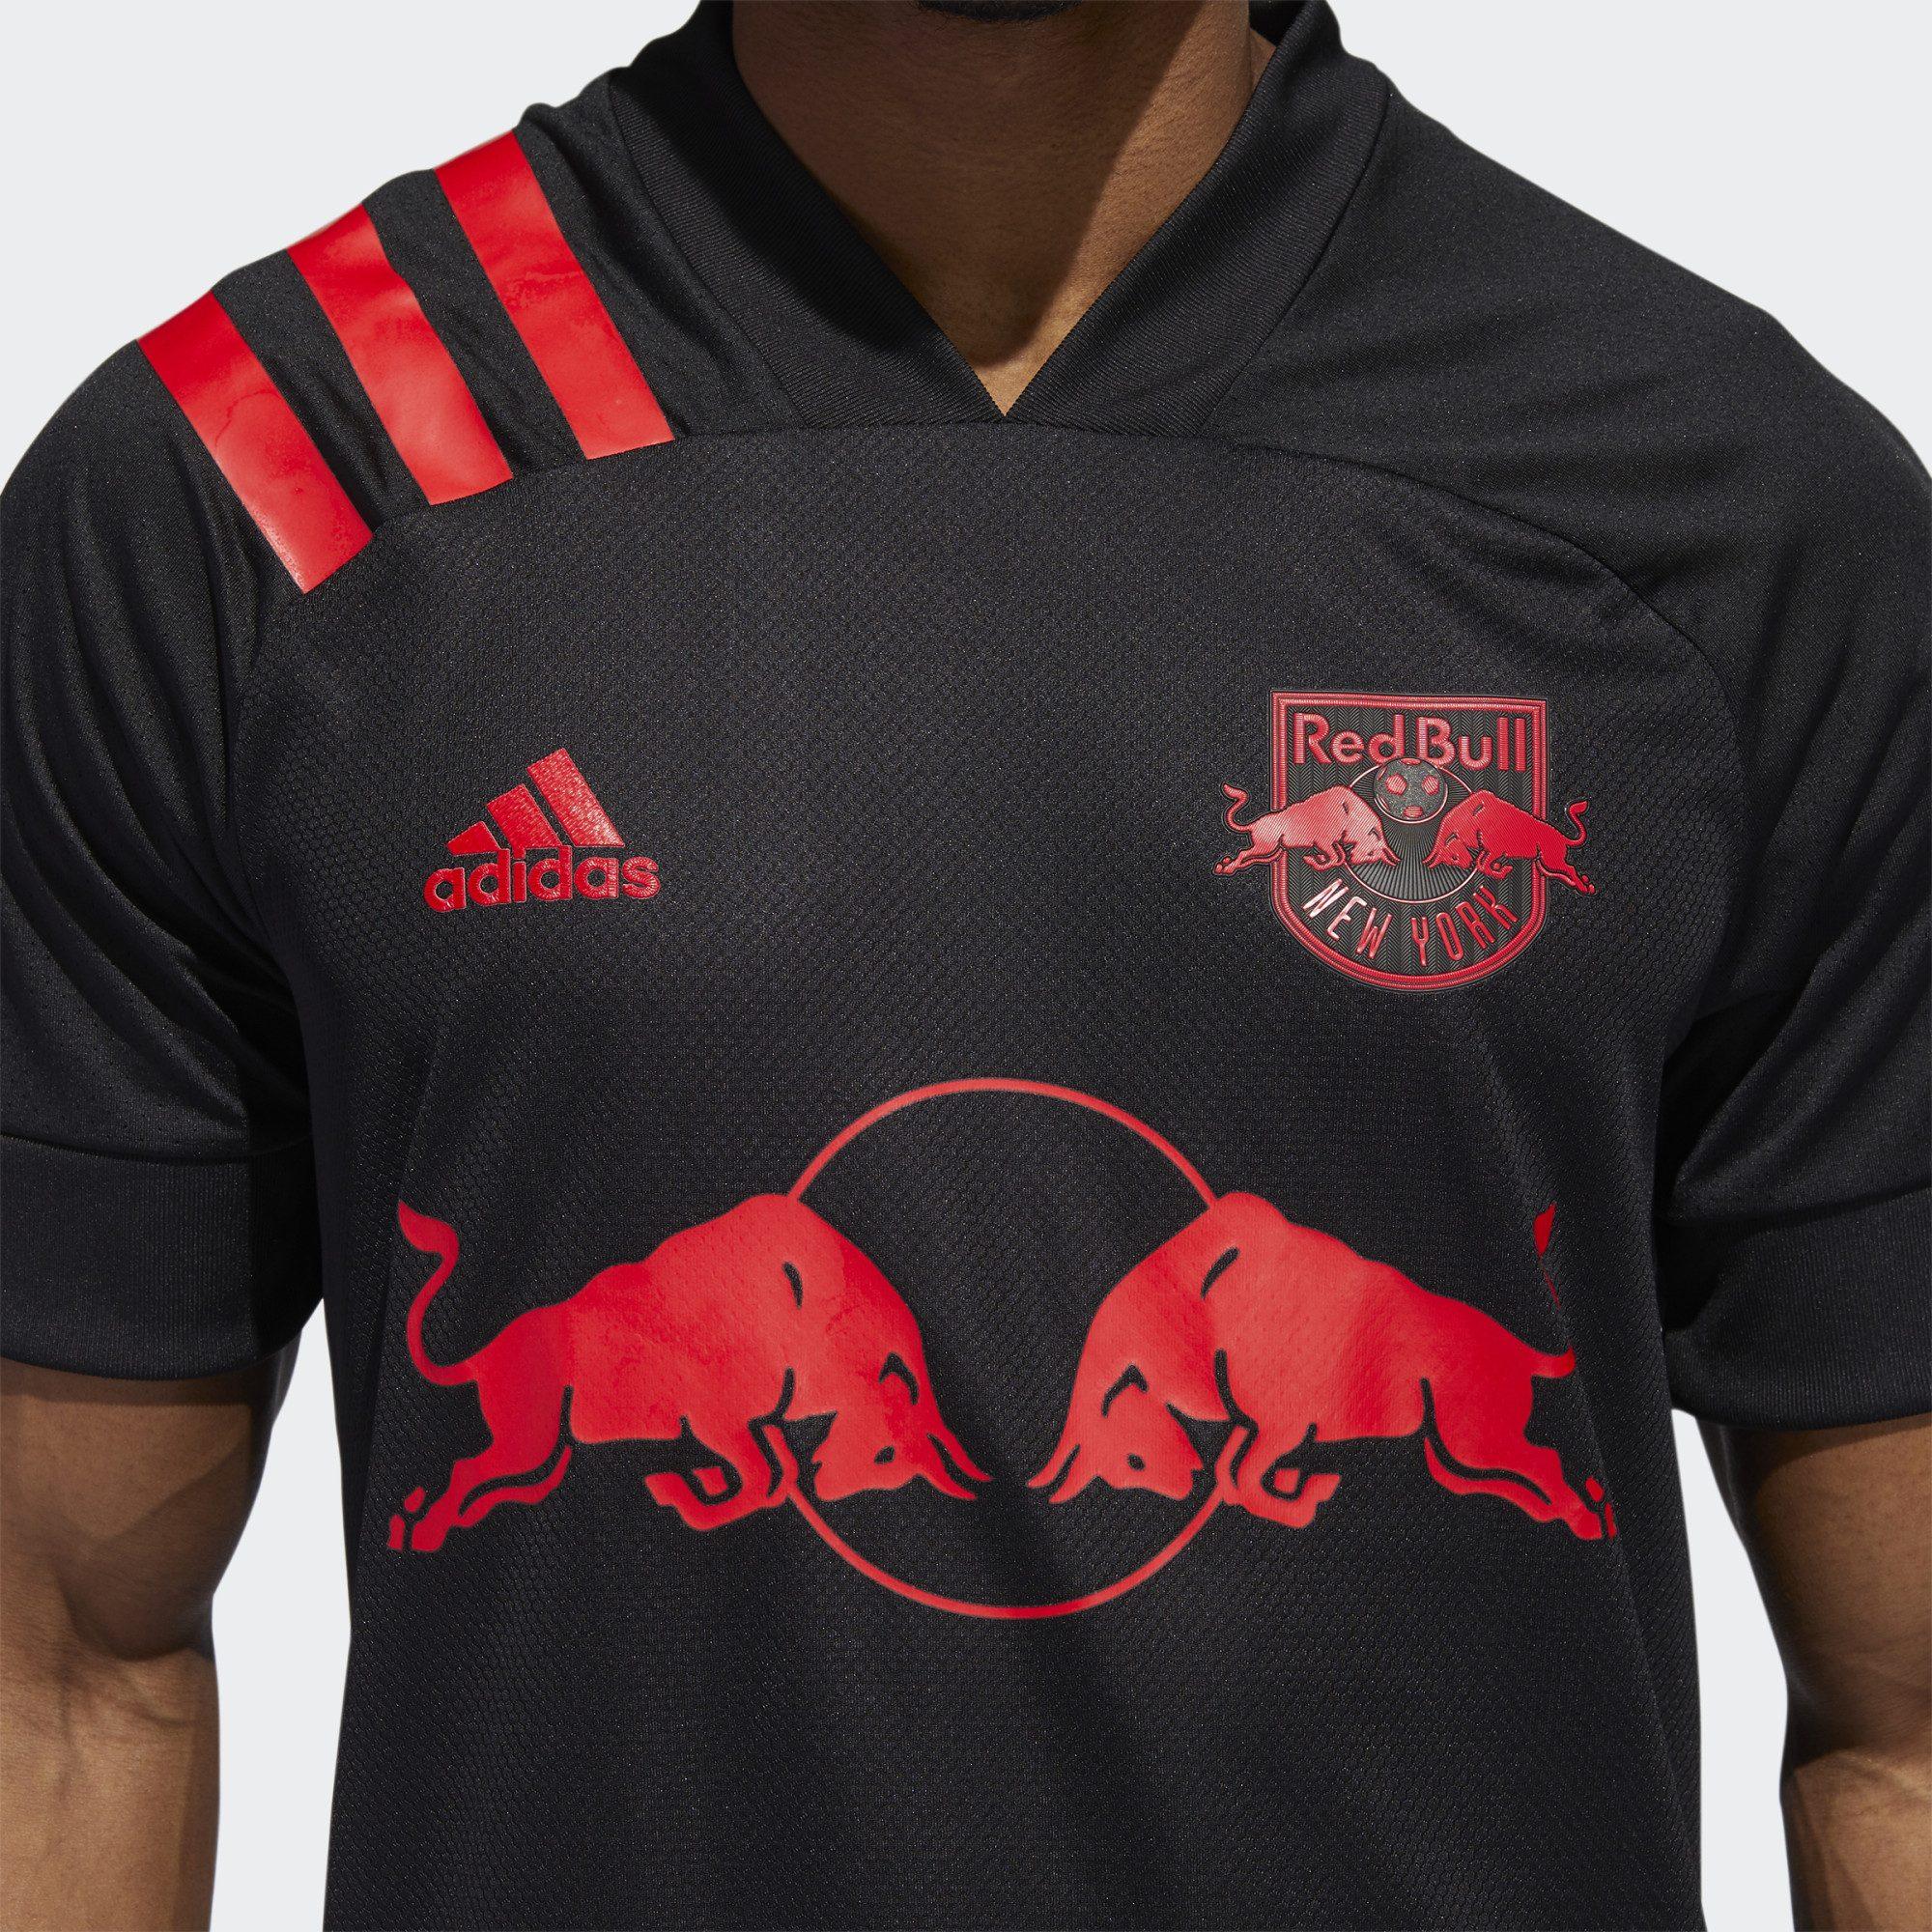 New York Red Bulls 2020-21 Adidas Away Kit   20/21 Kits   Football ...